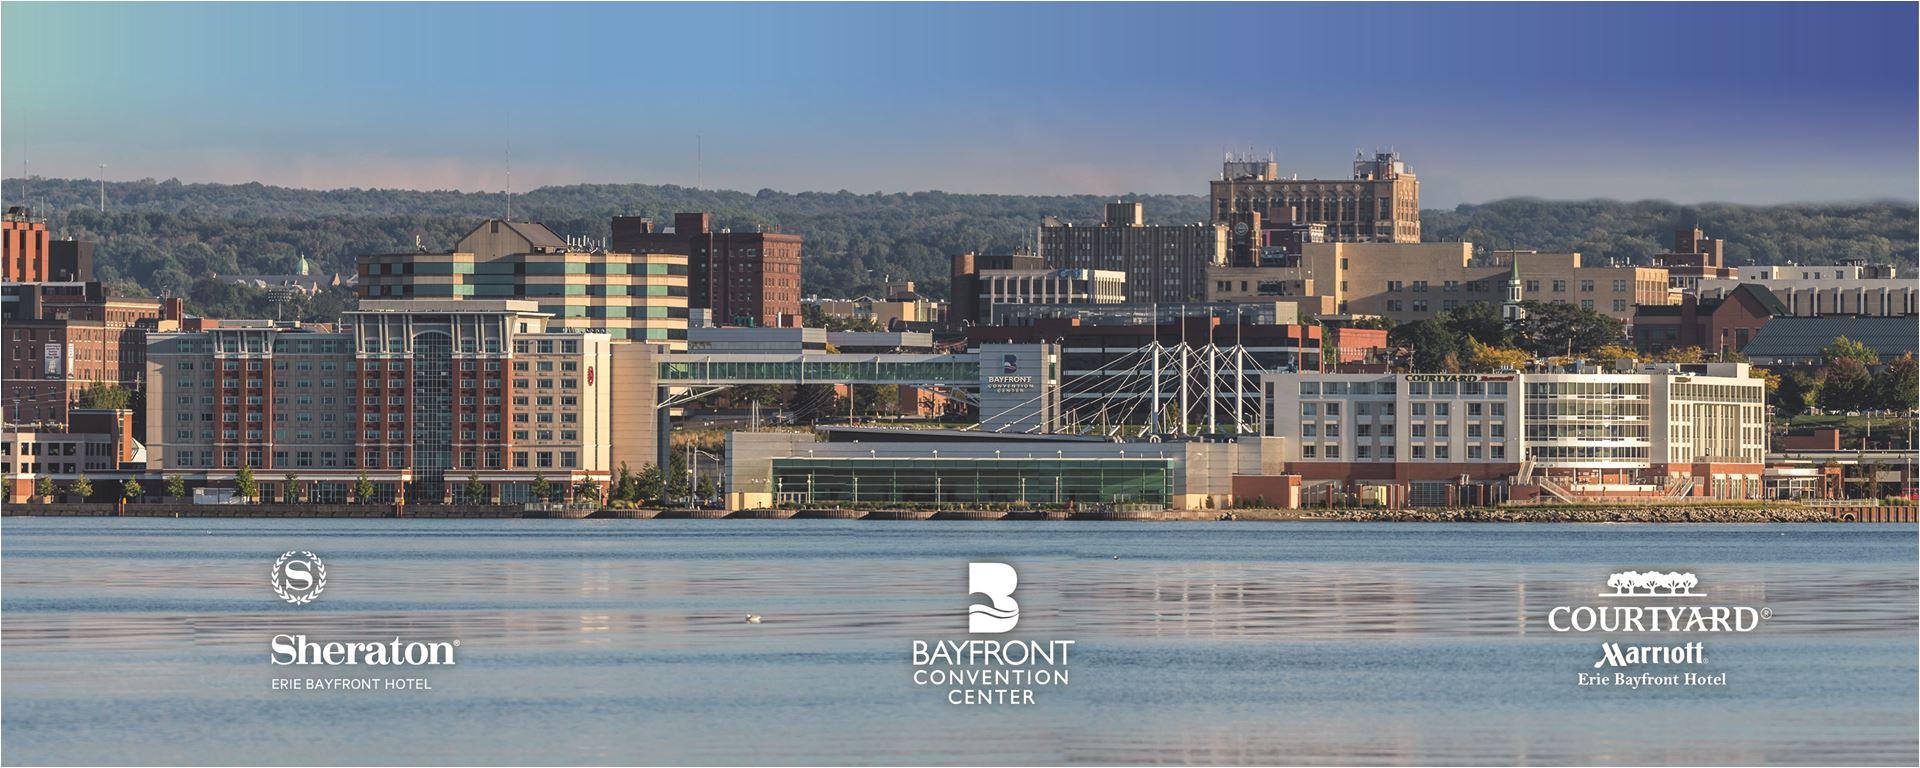 photo credit erie bayfront convention center